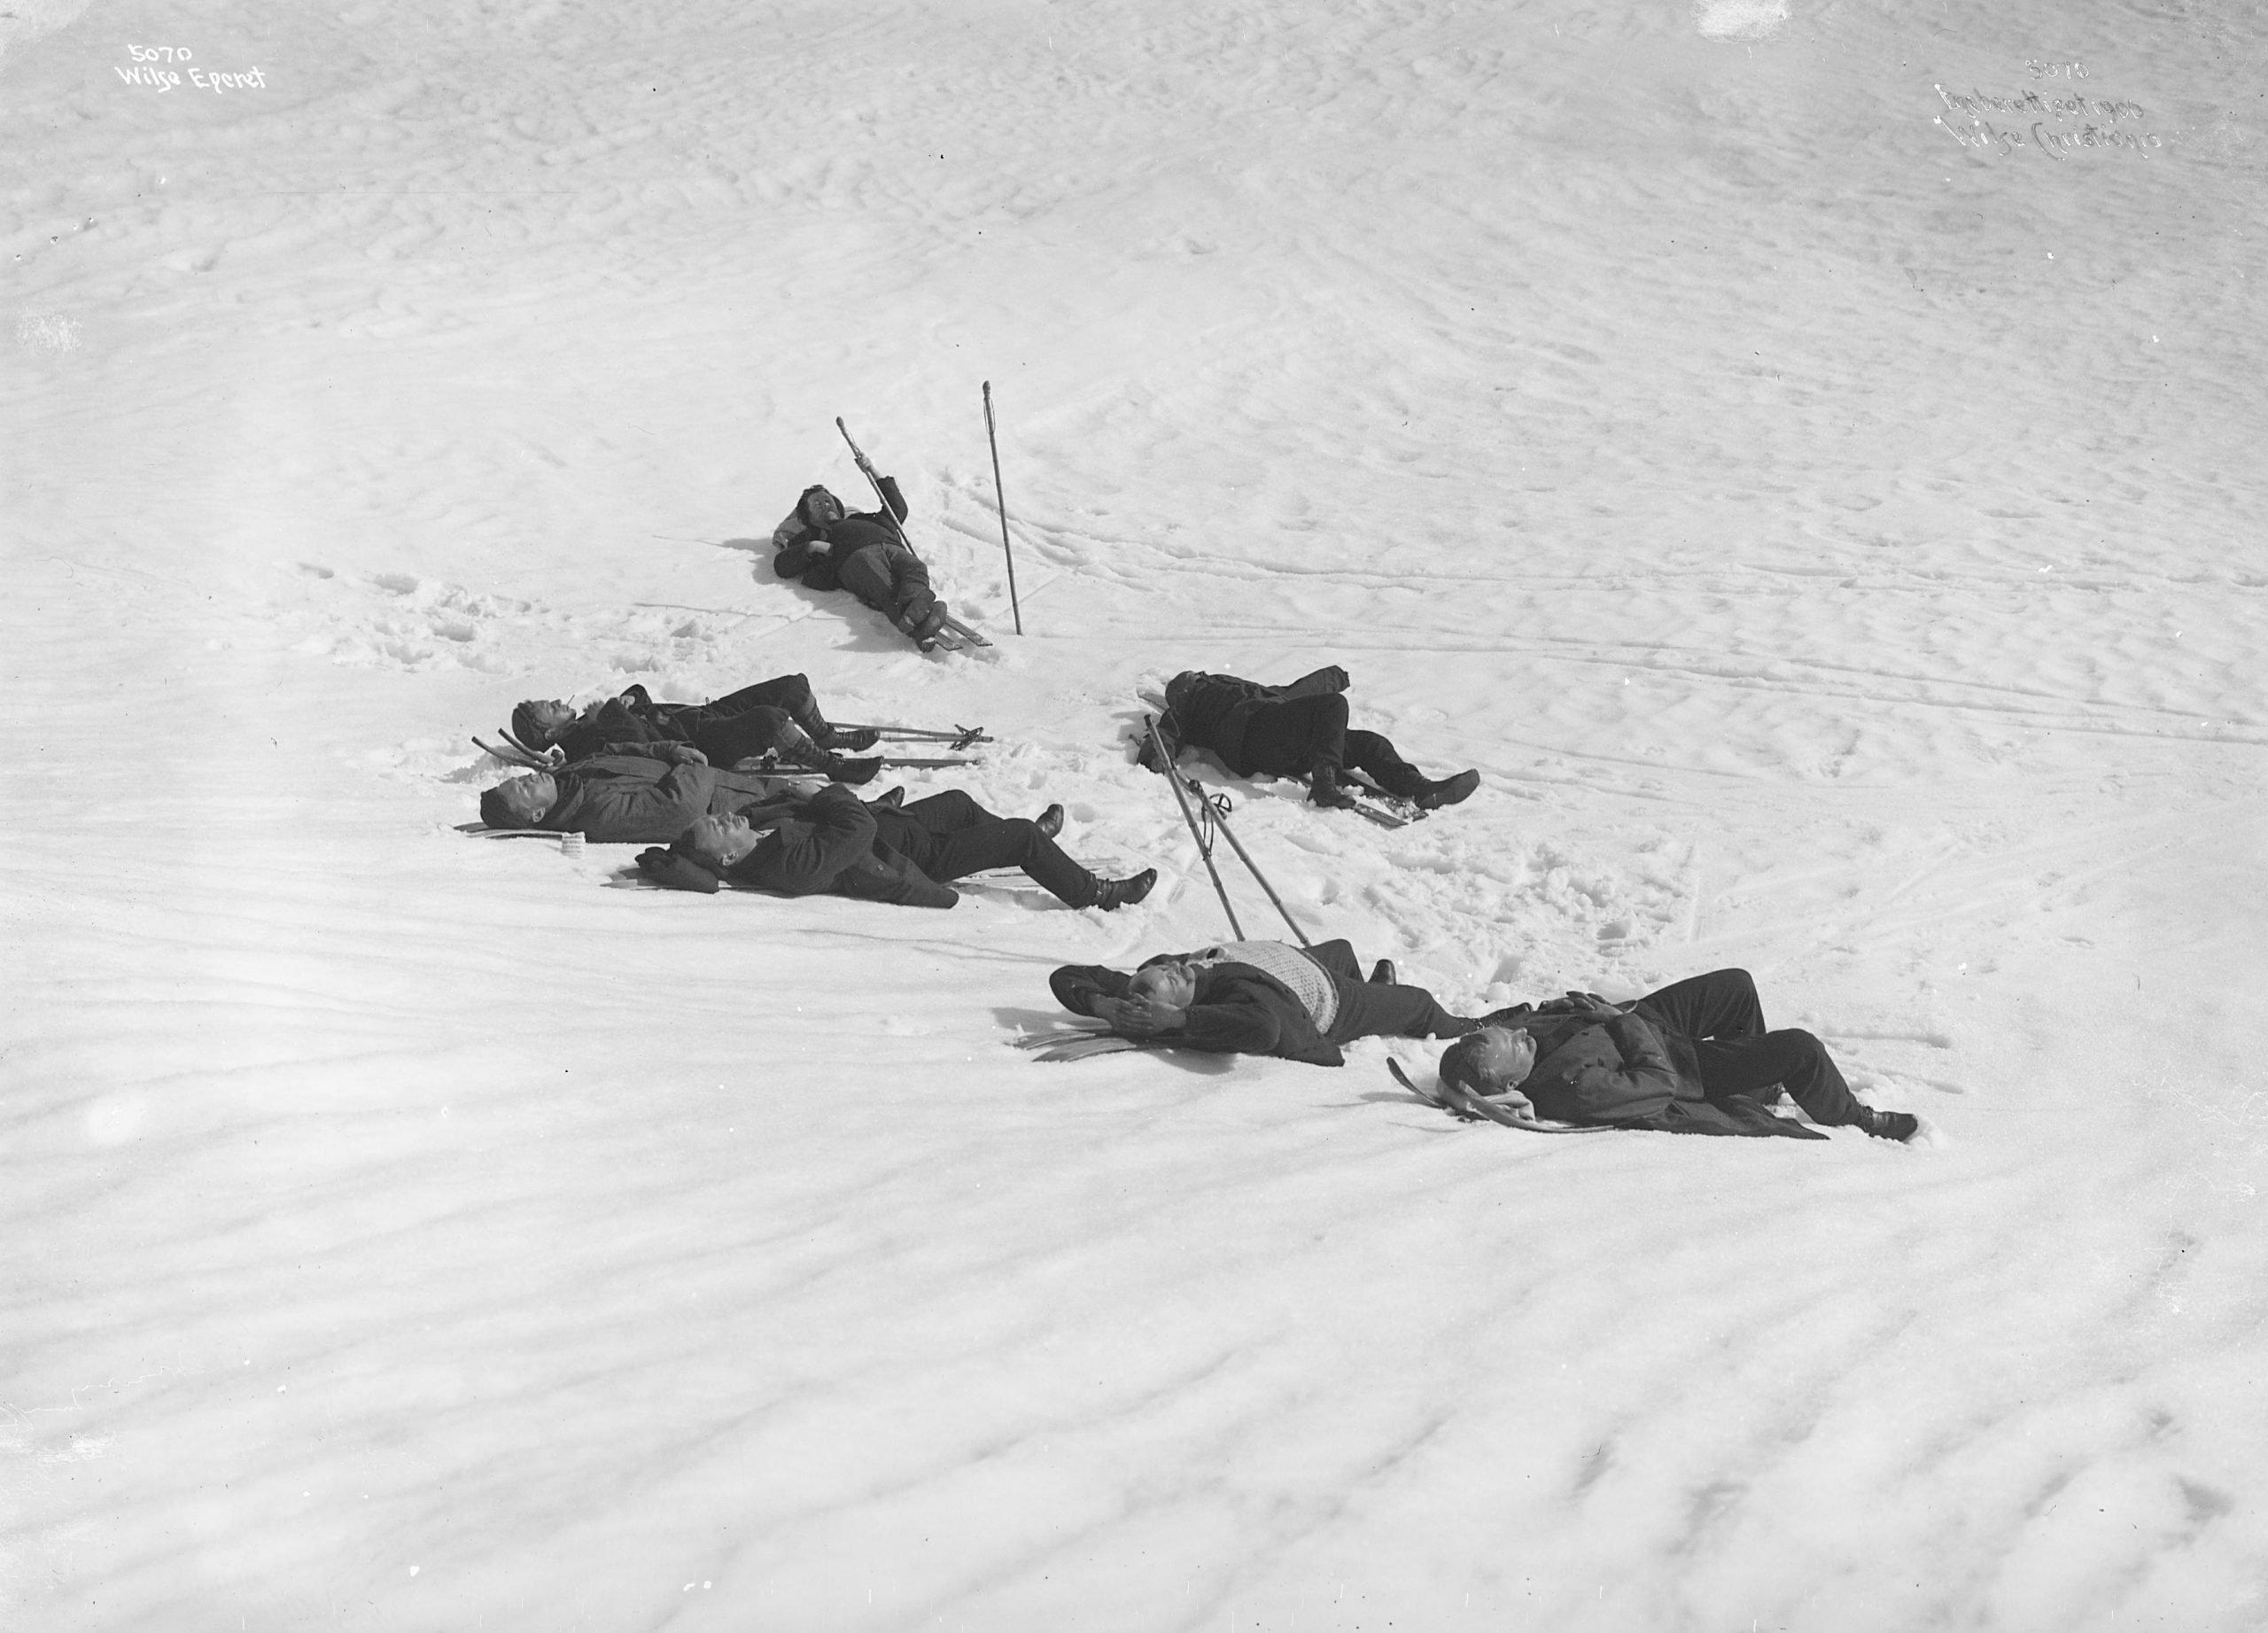 After a long winter, the Norwegians can't get enough of the warming sun. røttum, Sjusjøen, Ringsaker, Hedmark, Norway - Easter in 1906. | Photo: Anders Beer Wilse - Norsk Folkemuseum cc pdm.